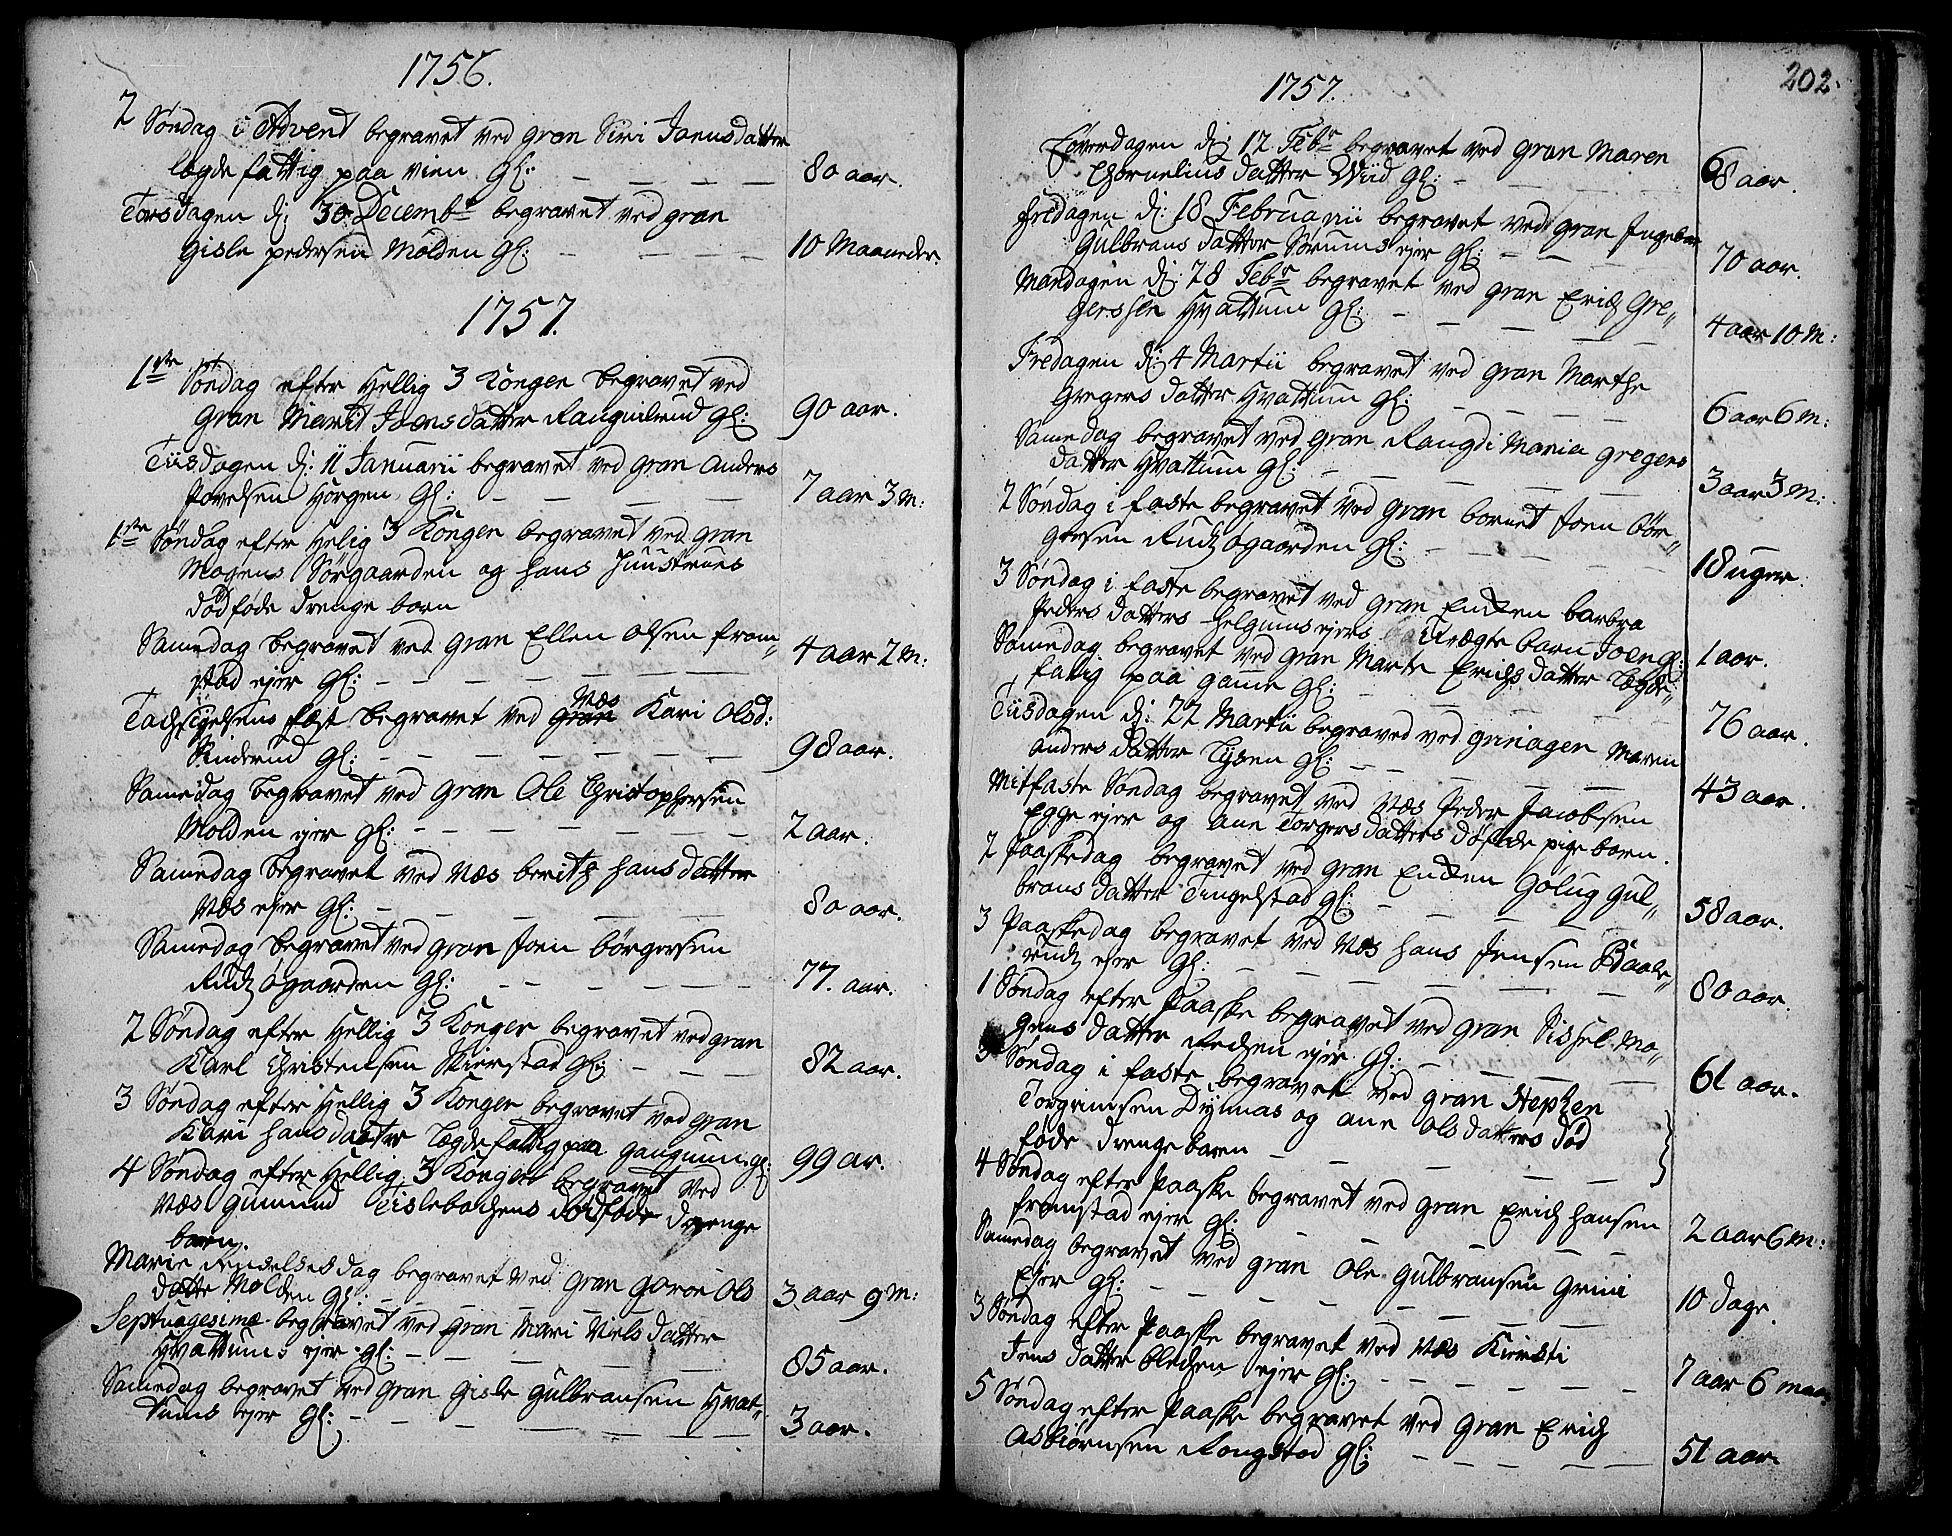 SAH, Gran prestekontor, Ministerialbok nr. 3, 1745-1758, s. 202